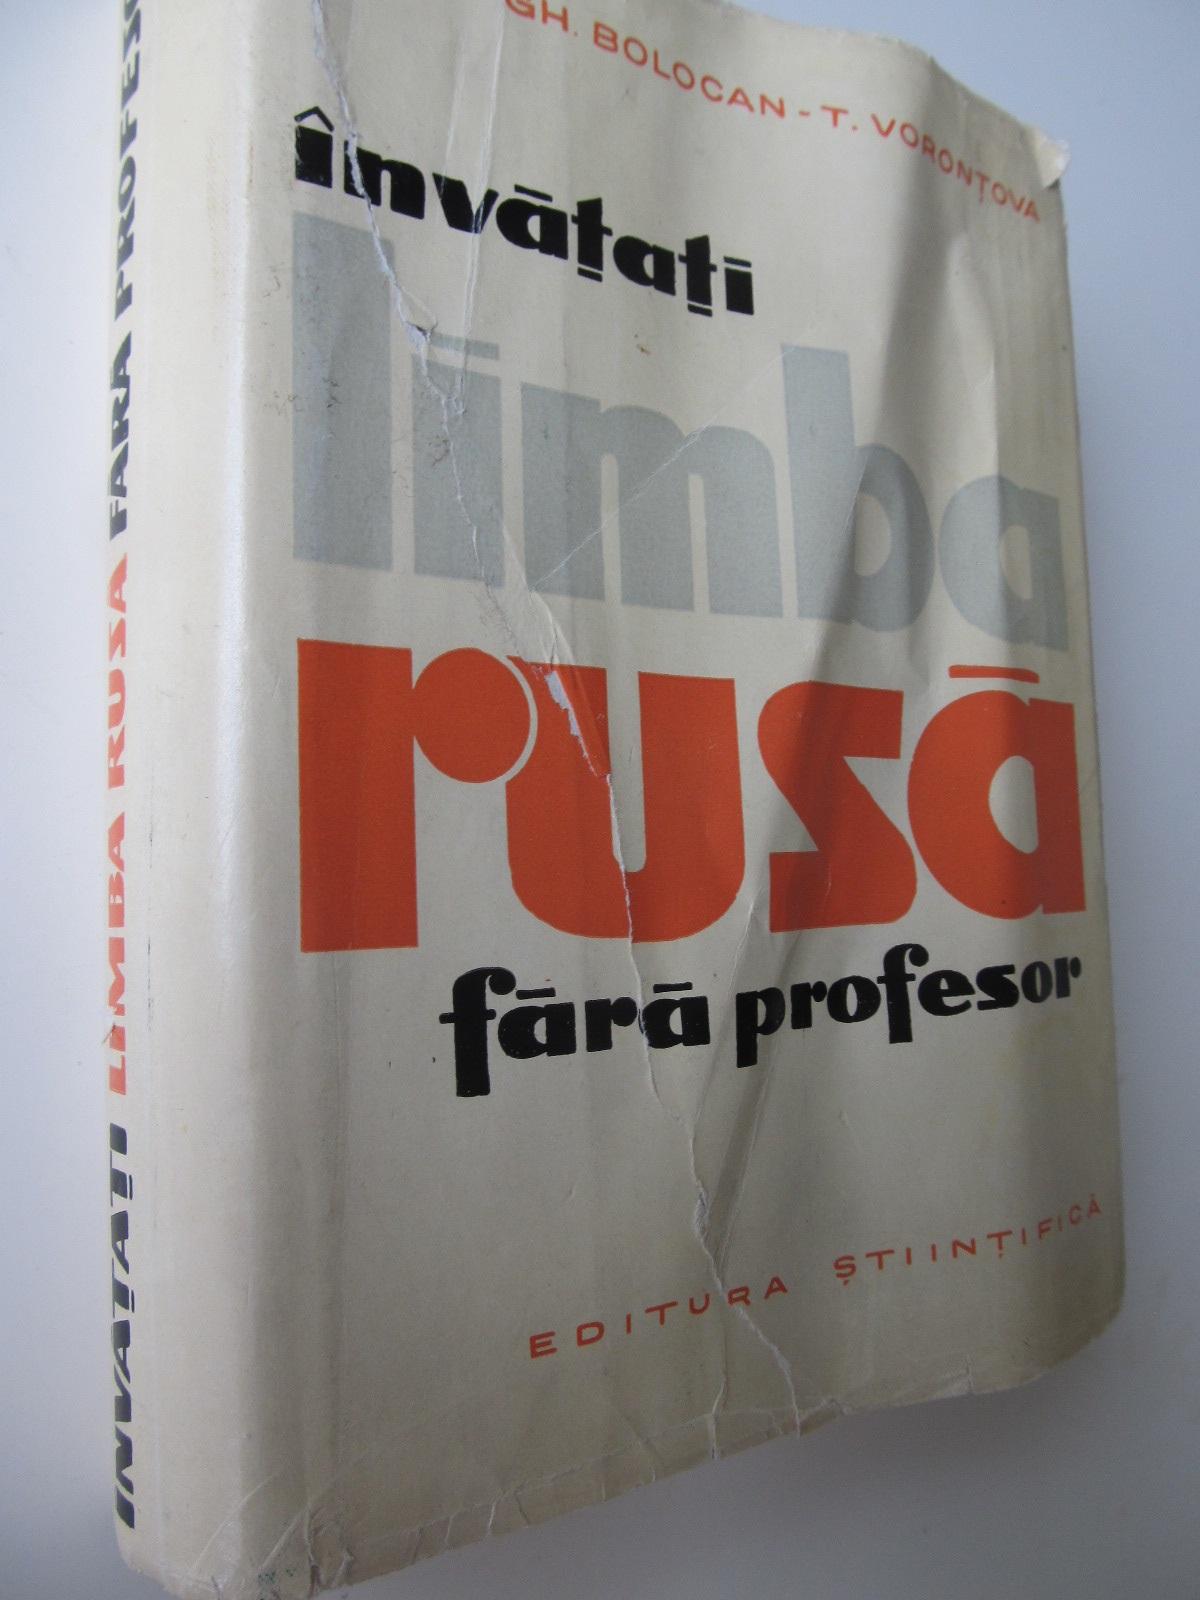 Invatati limba rusa fara profesor (cu supracoperta) - Gh. Bolocan , T. Vorontova | Detalii carte